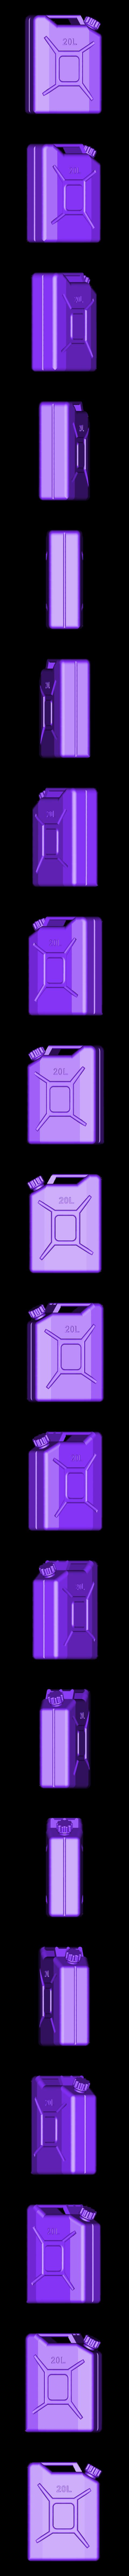 Fuel tank 20L V1.stl Download free STL file Jerry can Fuel can TRX4 SCX10 K5 RC4WD scale rc • 3D printable object, kiatkla